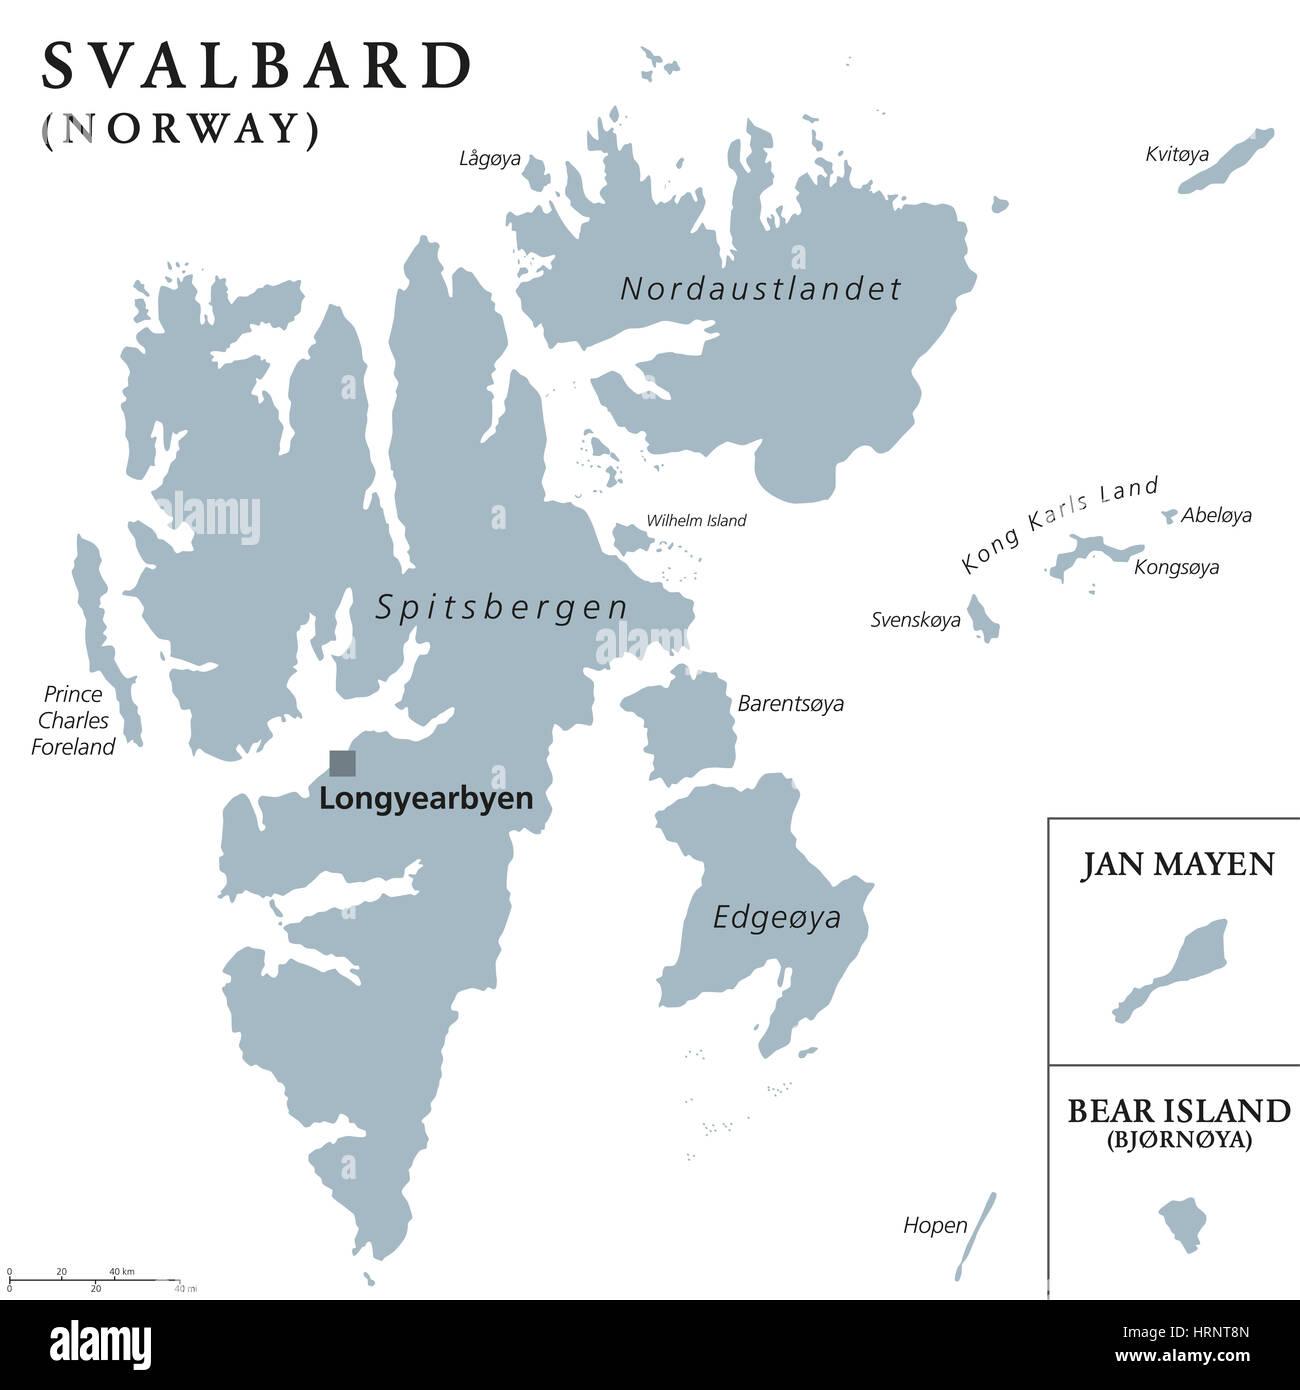 Svalbard Bear Island and Jan Mayen political map Norwegian Stock